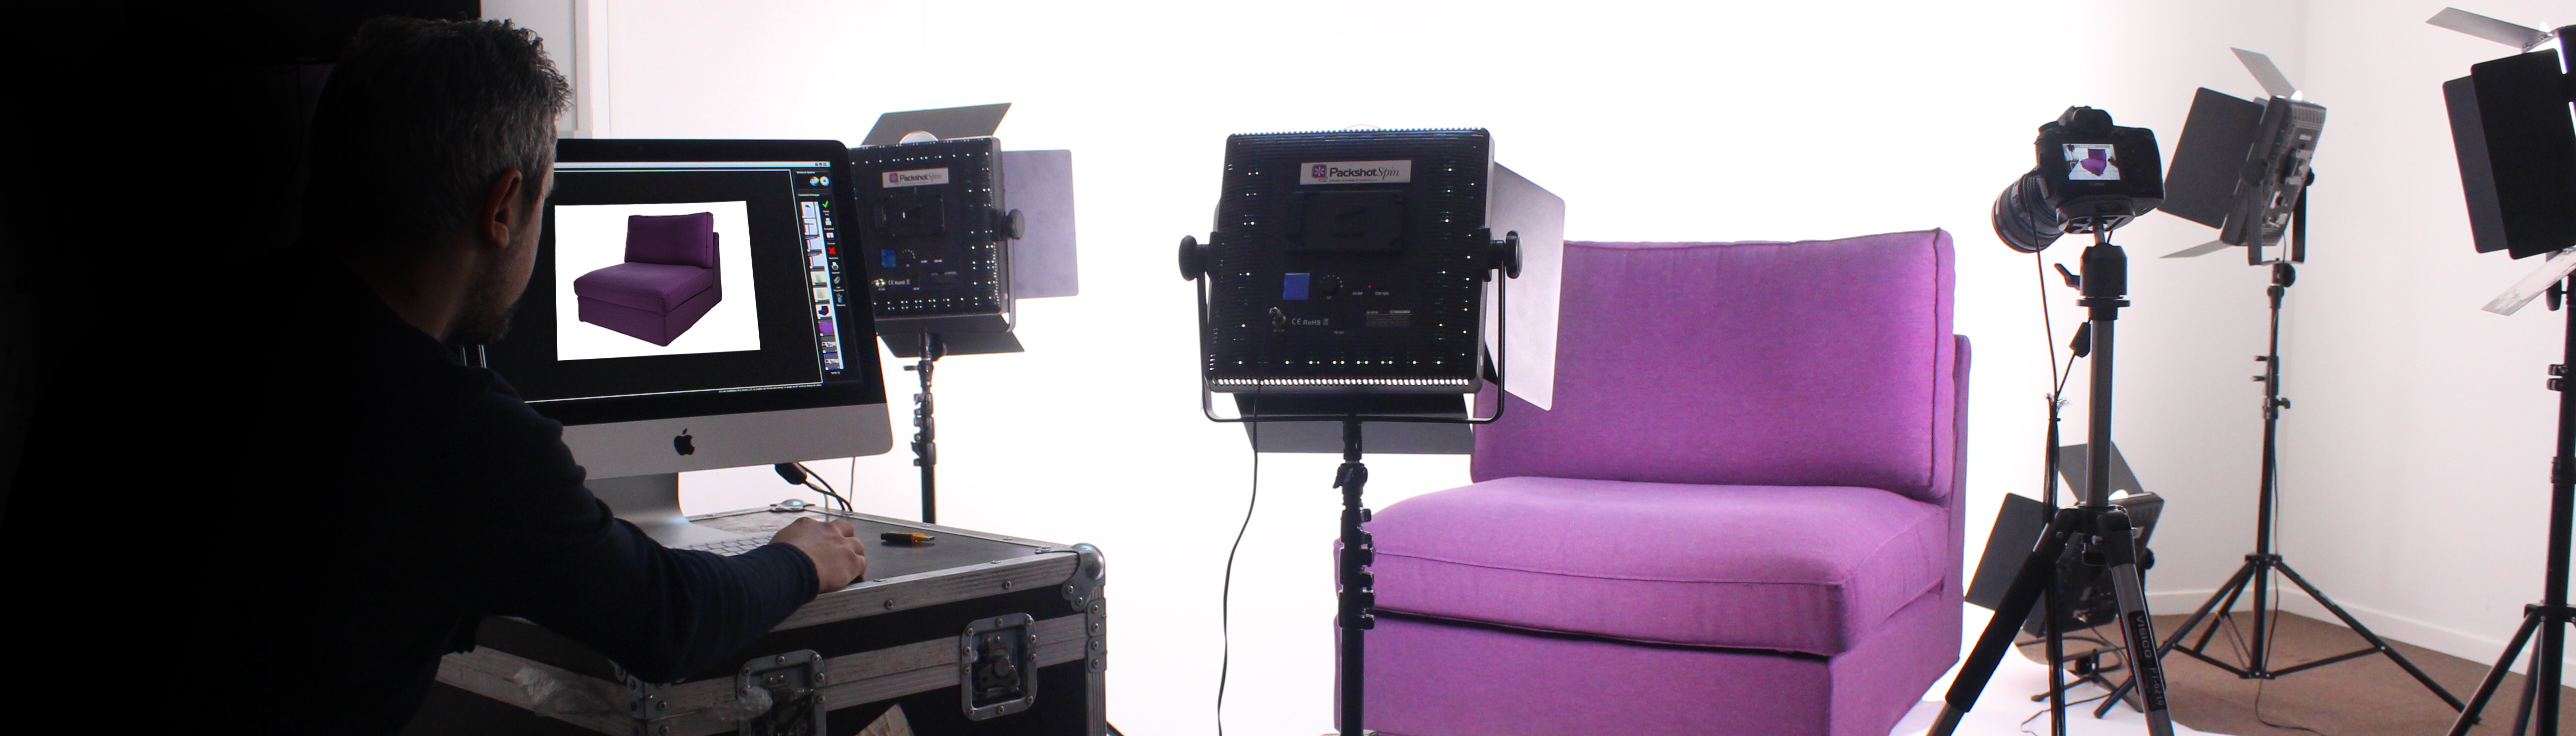 Furniture photoshoot : products studio photographer